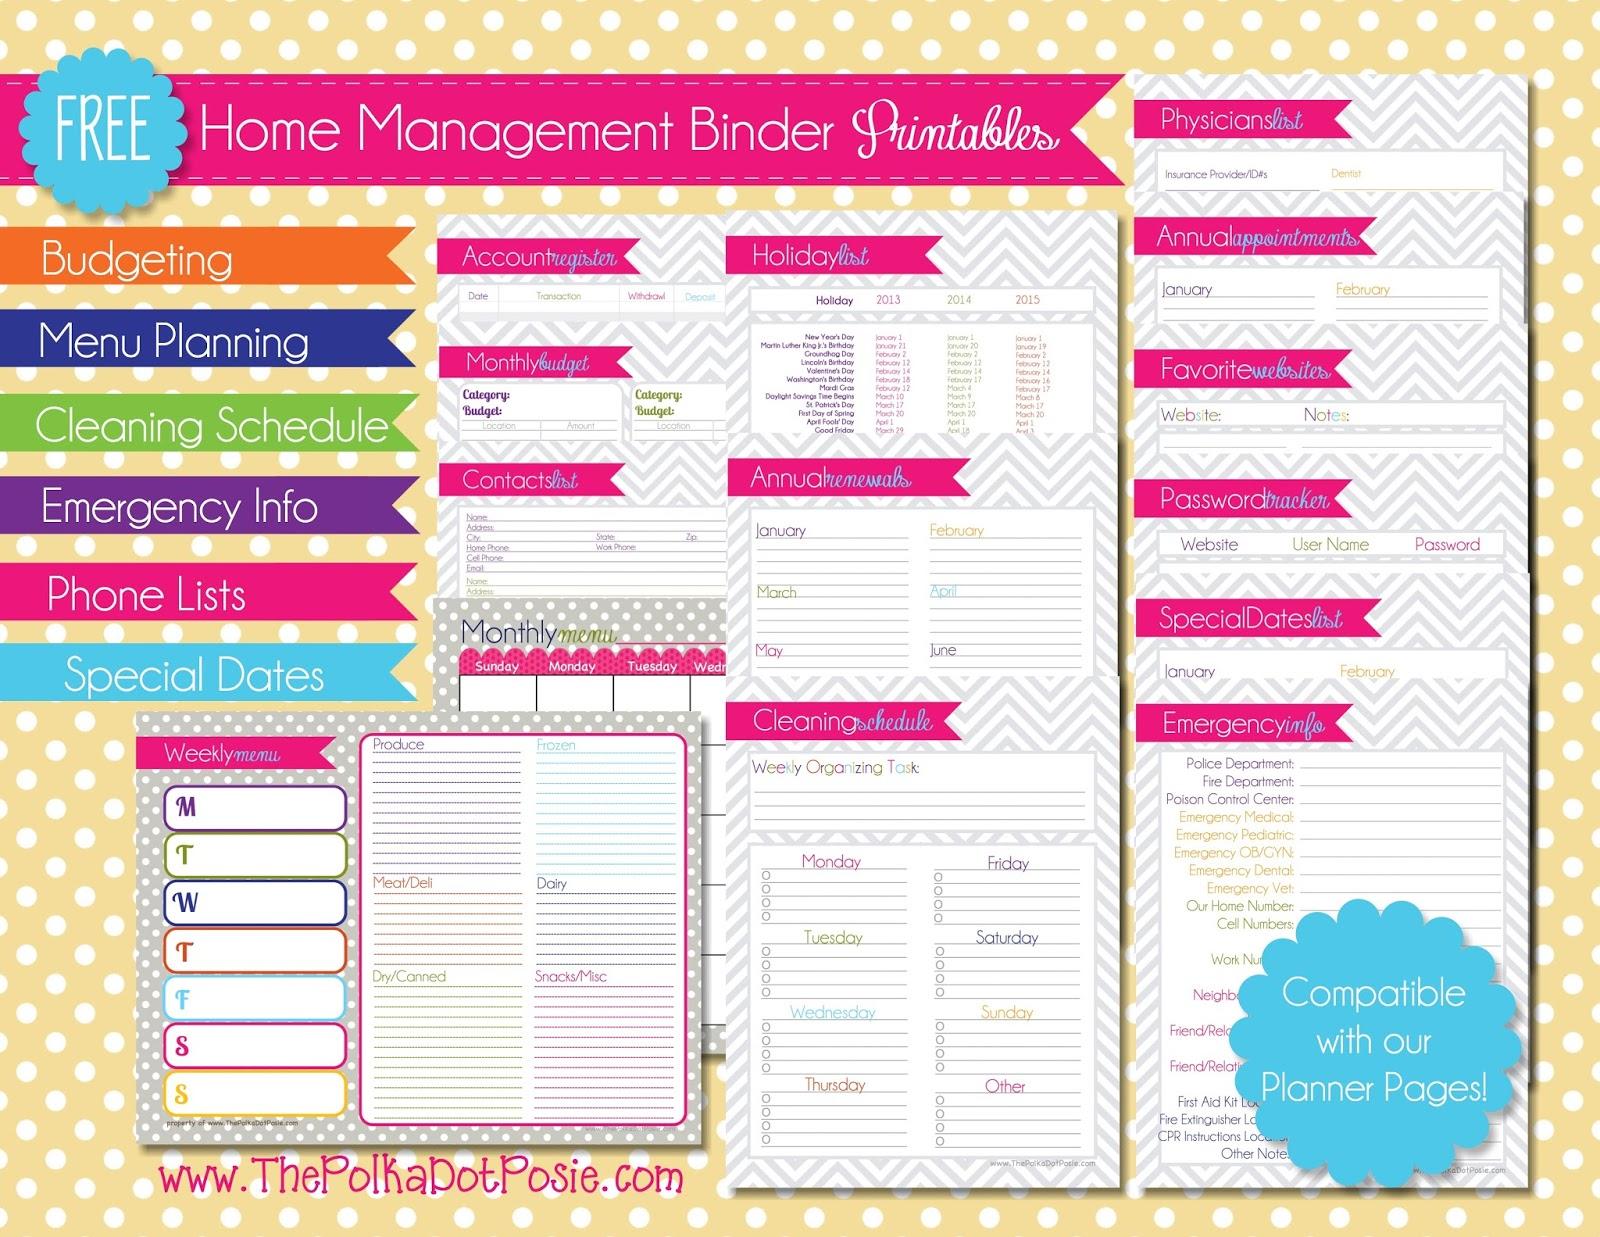 7 Best Images Of Free Printable Home Management Worksheets